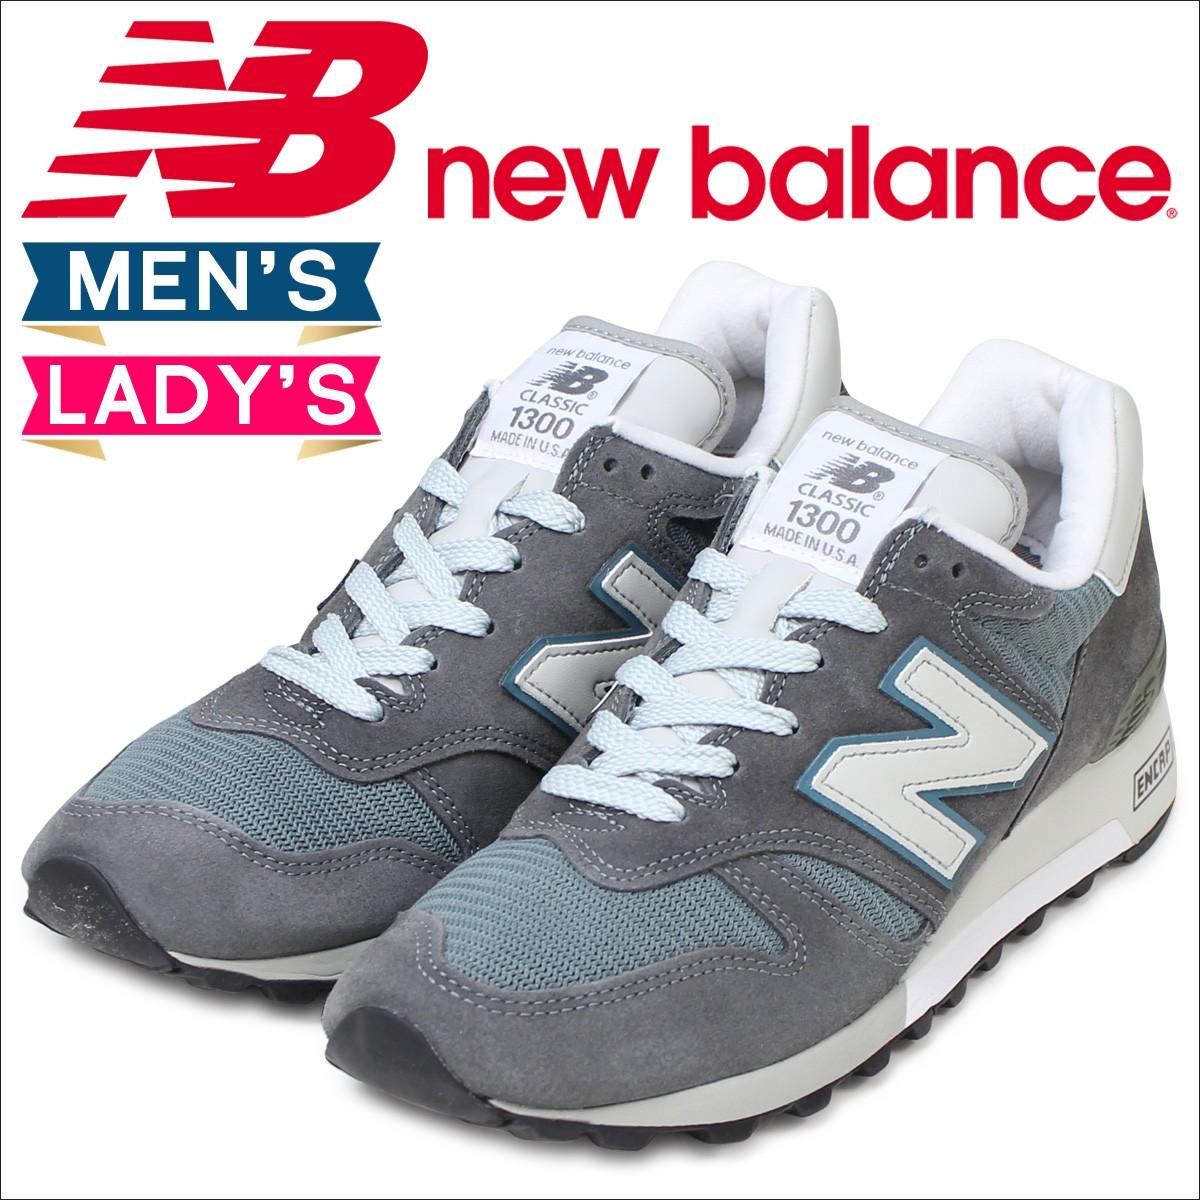 f:id:shoesmaster:20210904214402p:plain